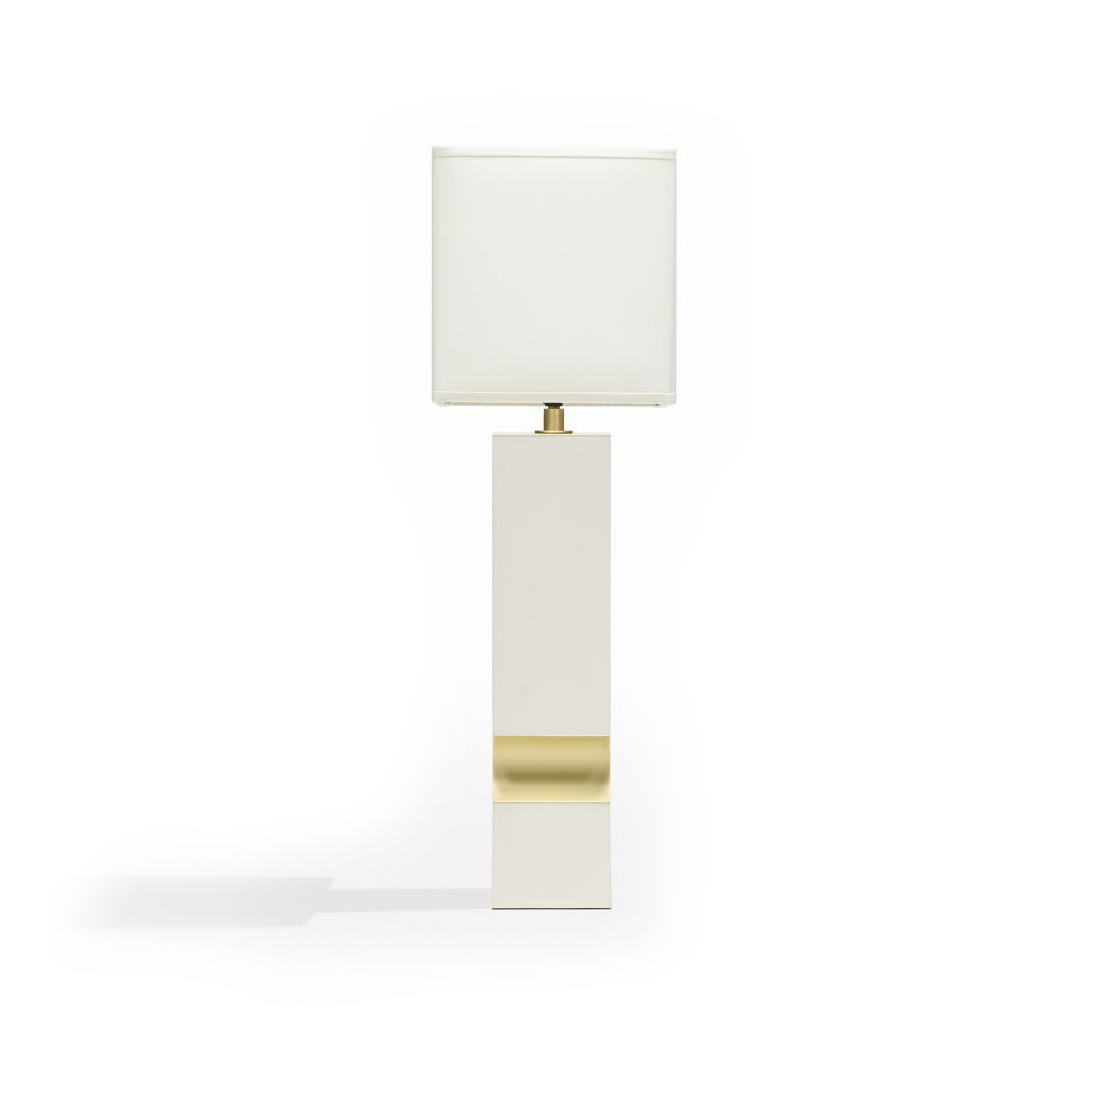 Brianza Table Lamp by Jean De Merry